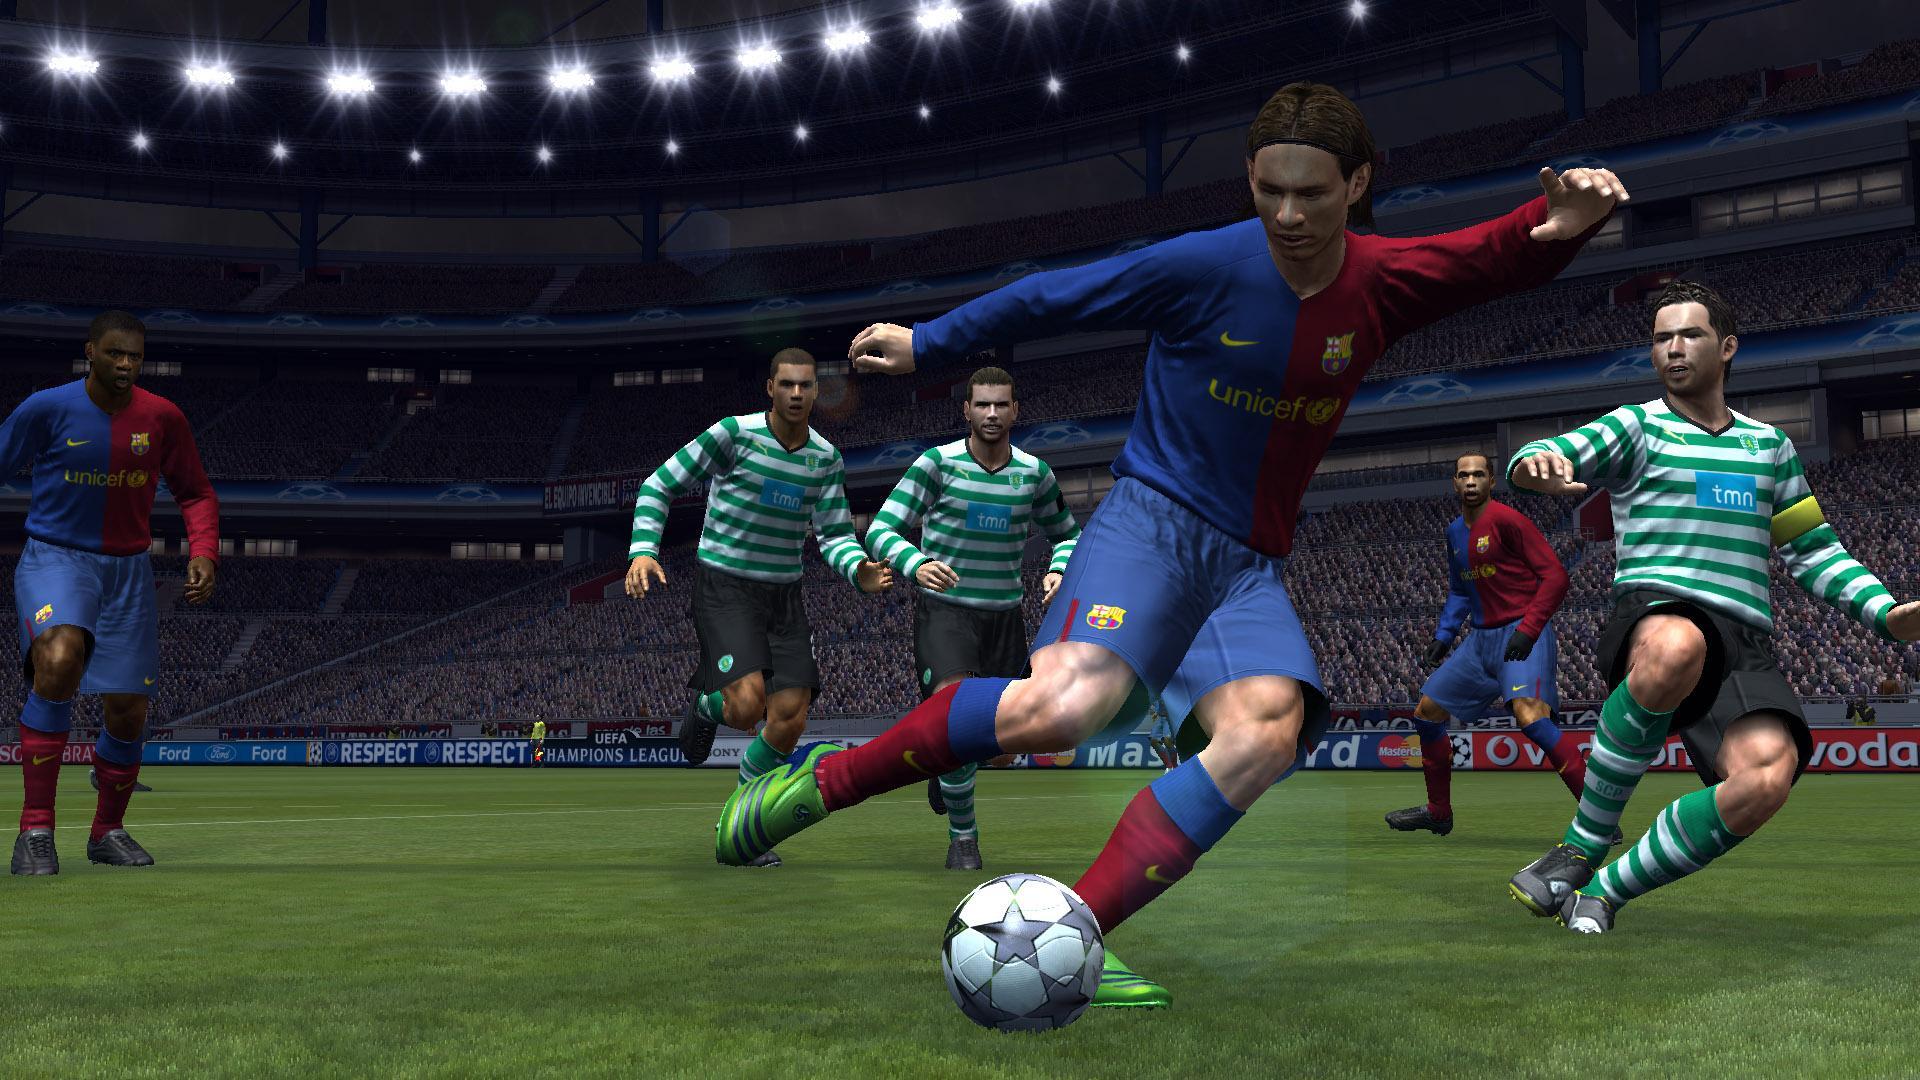 Pro Evolution Soccer 2009 Demo